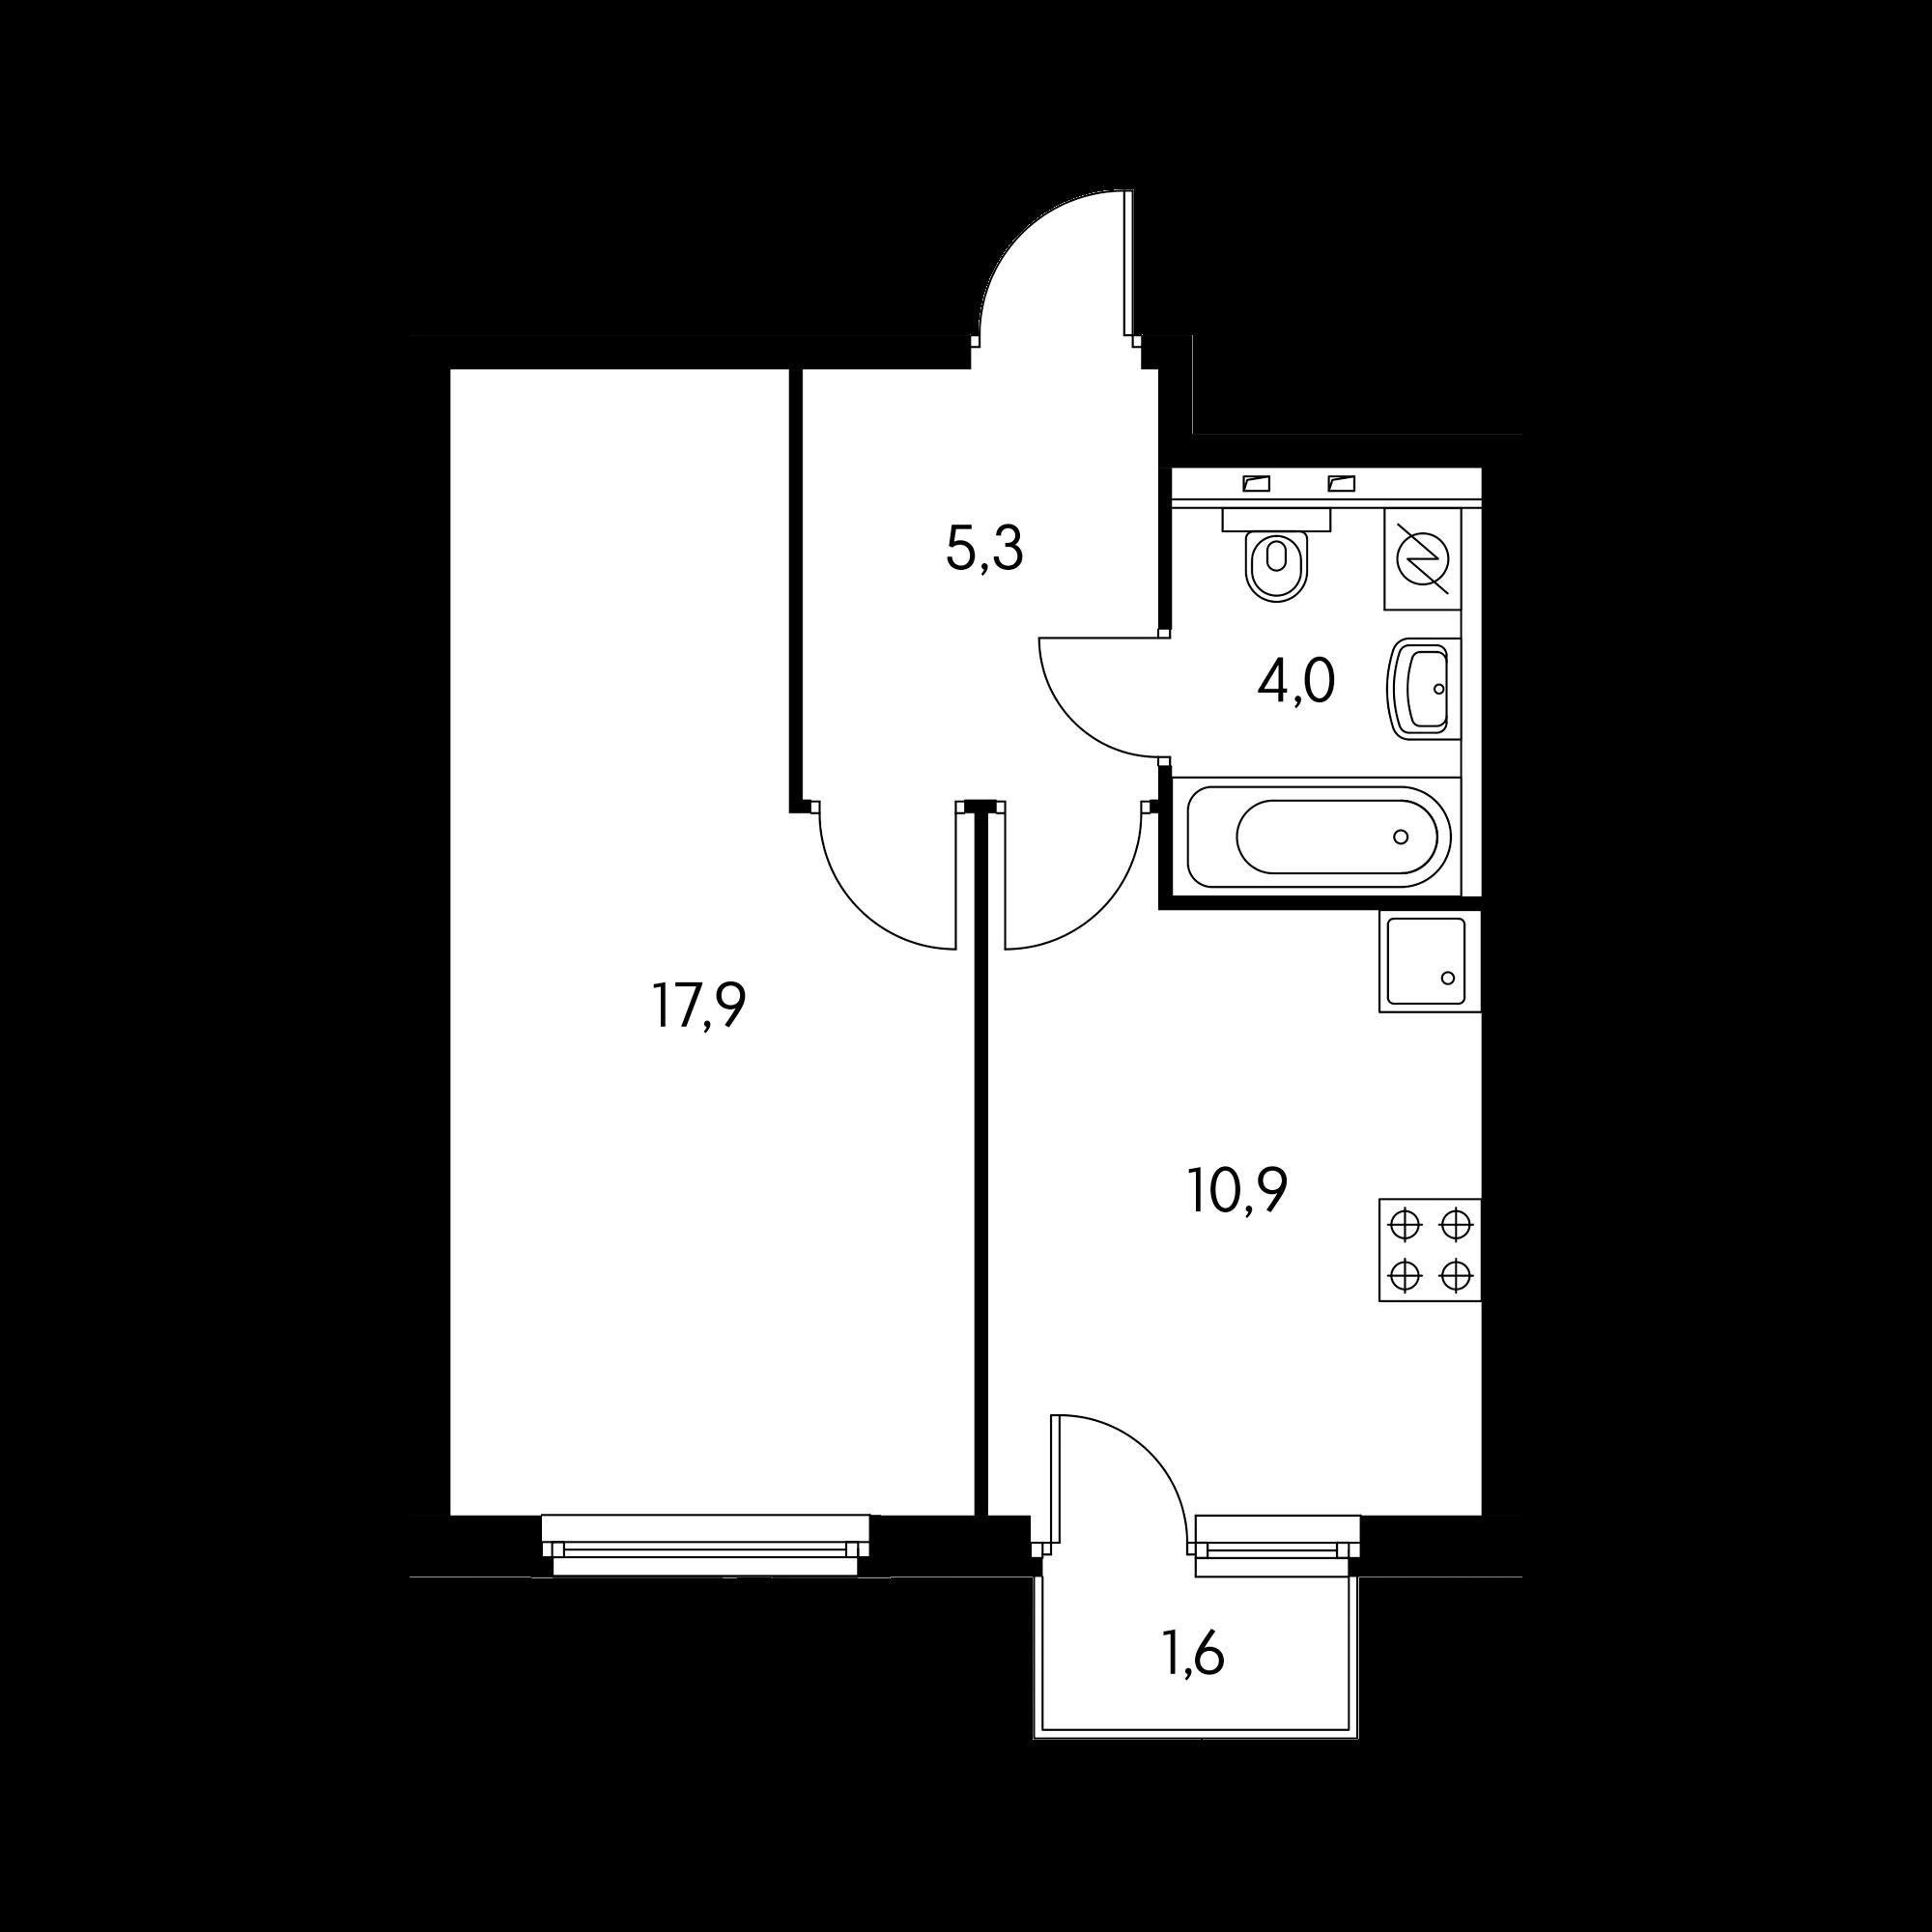 1KM1_6.3-1_B2